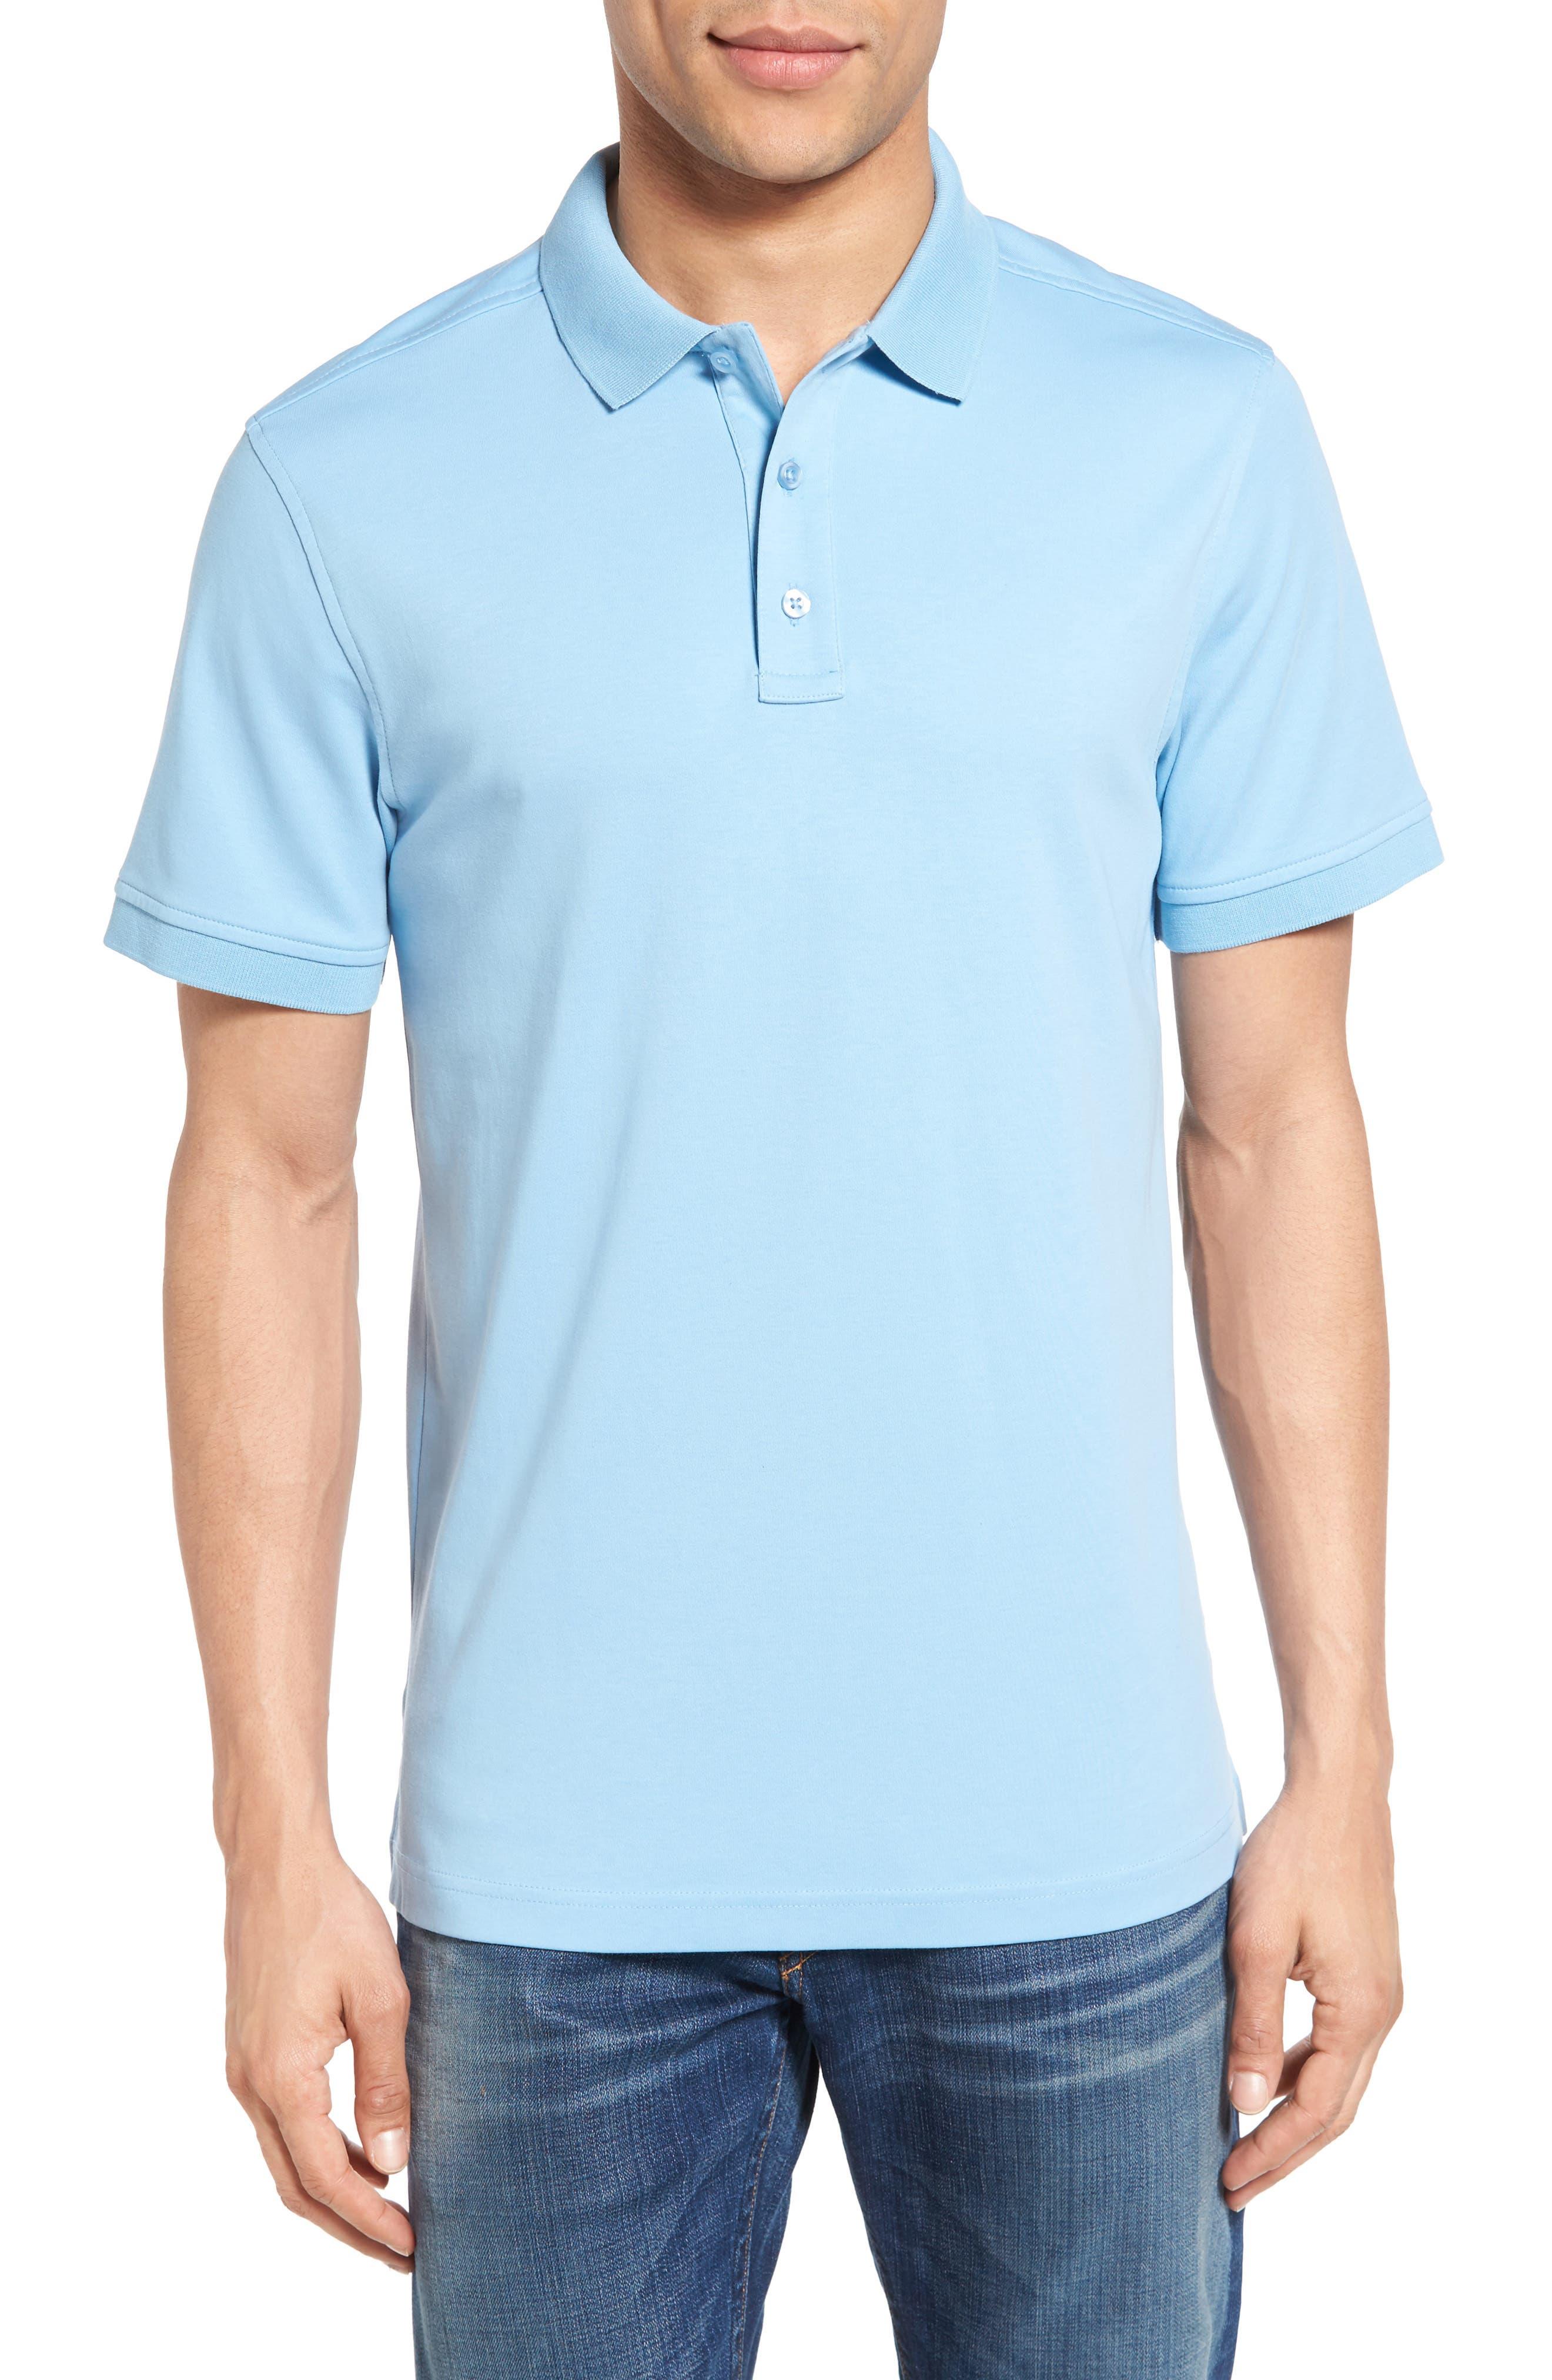 Alternate Image 1 Selected - Nordstrom Men's Shop Slim Fit Interlock Knit Polo